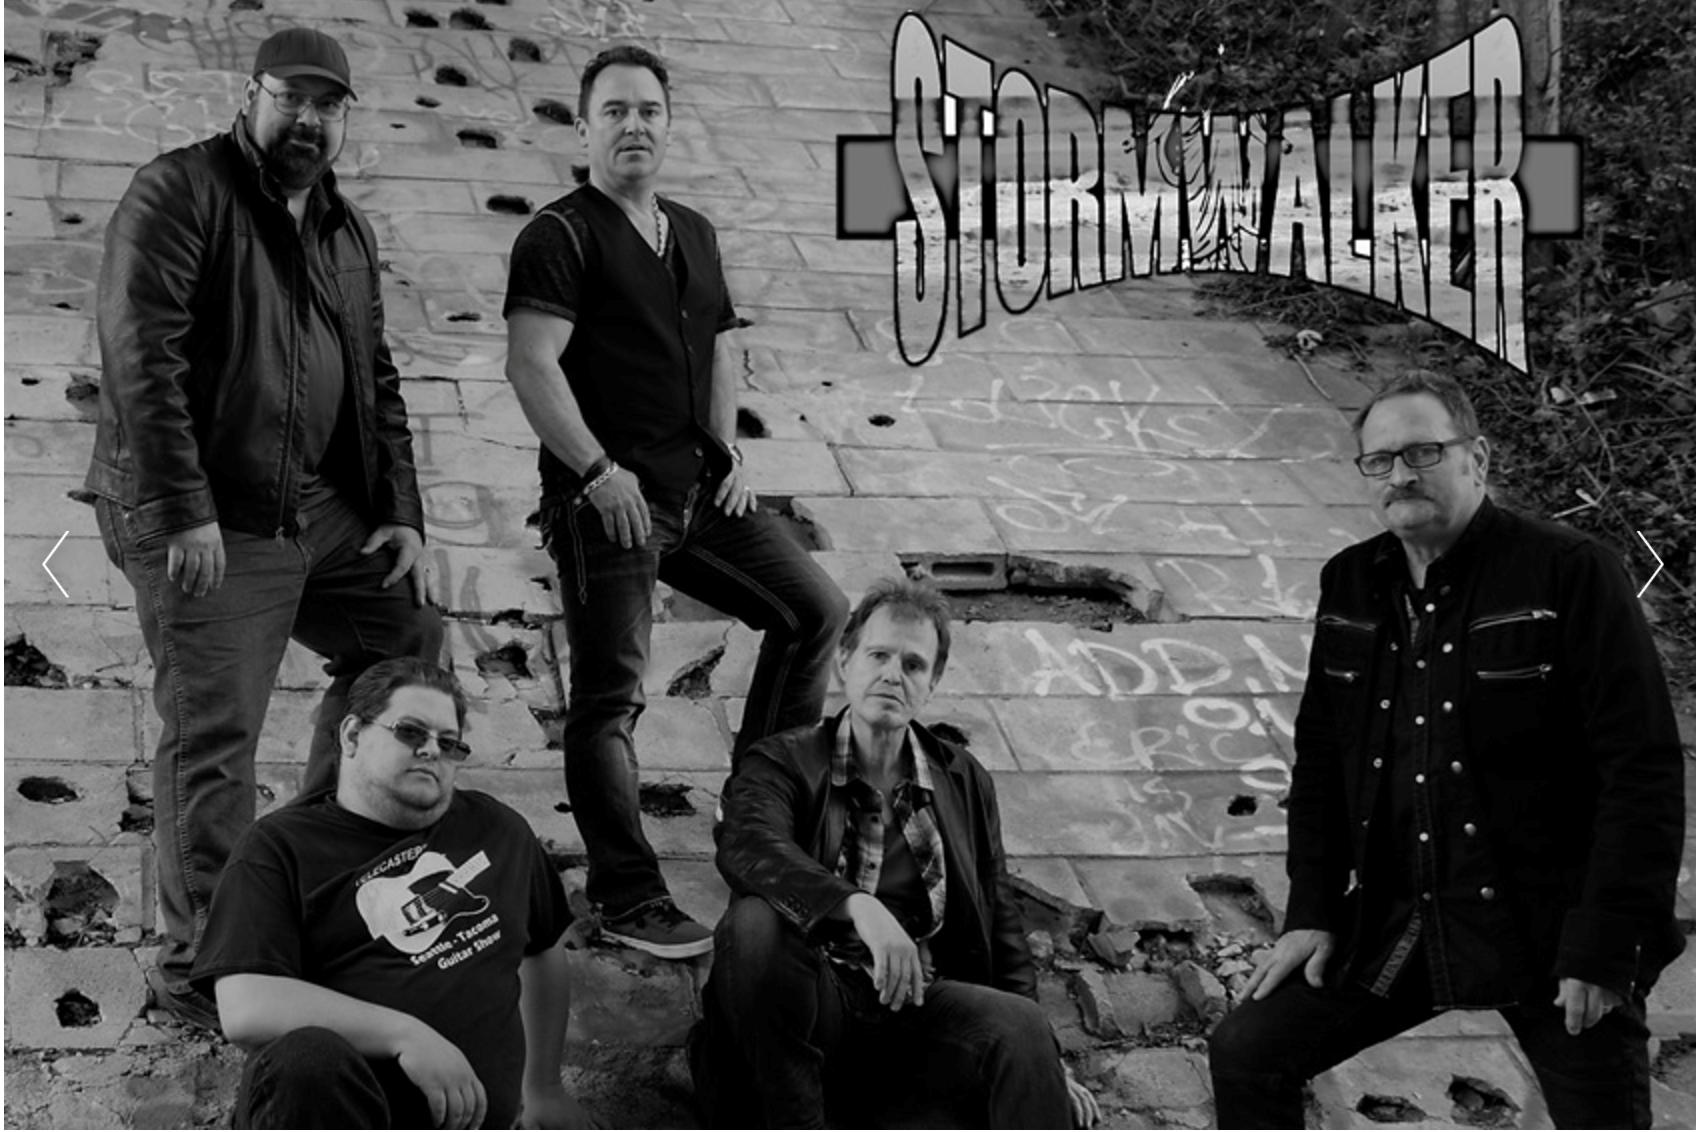 Stormwalker - Rock   NEW ARTIST